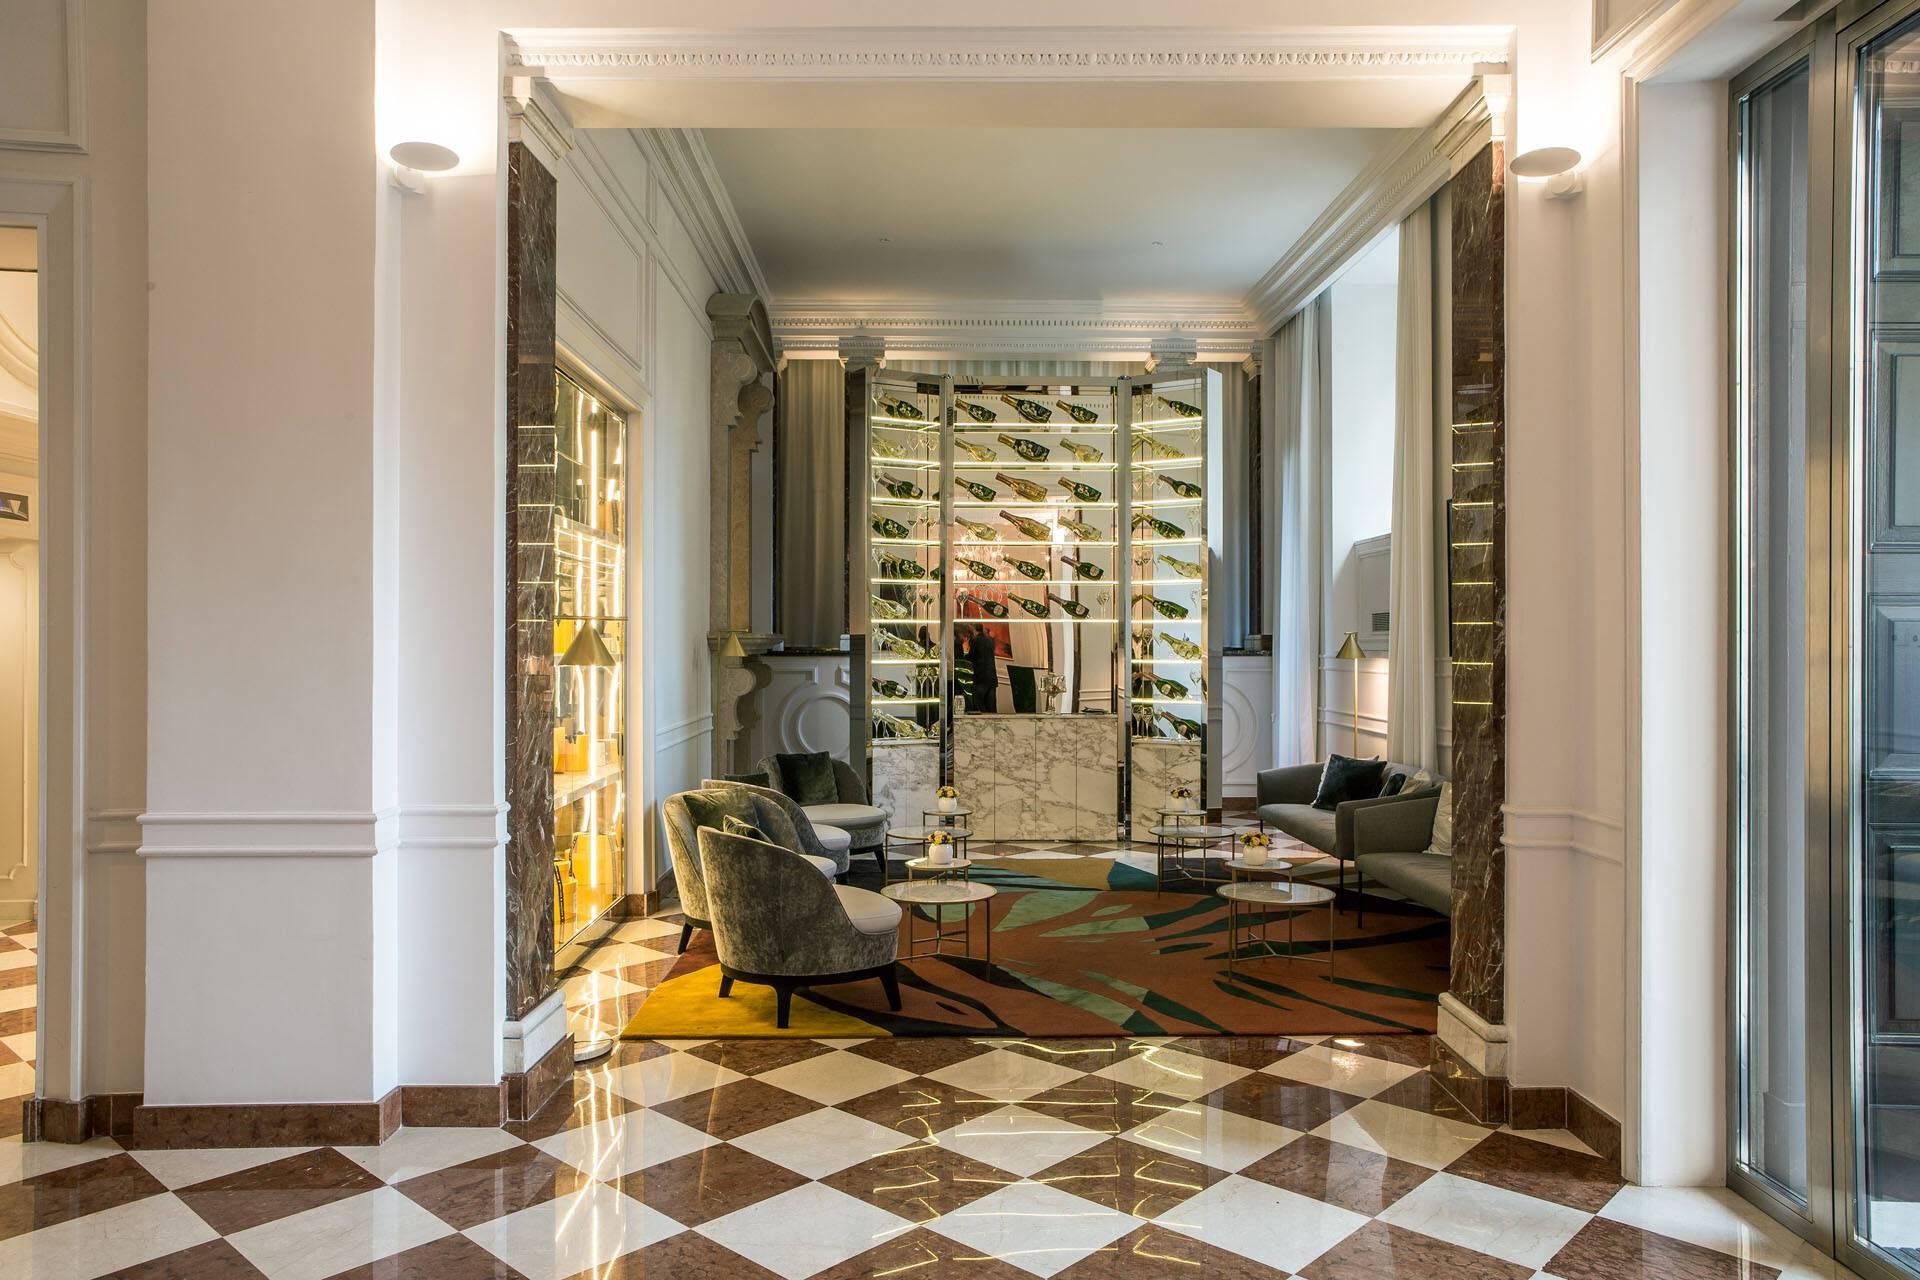 Sofitel Villa Borghese Rome Lobby